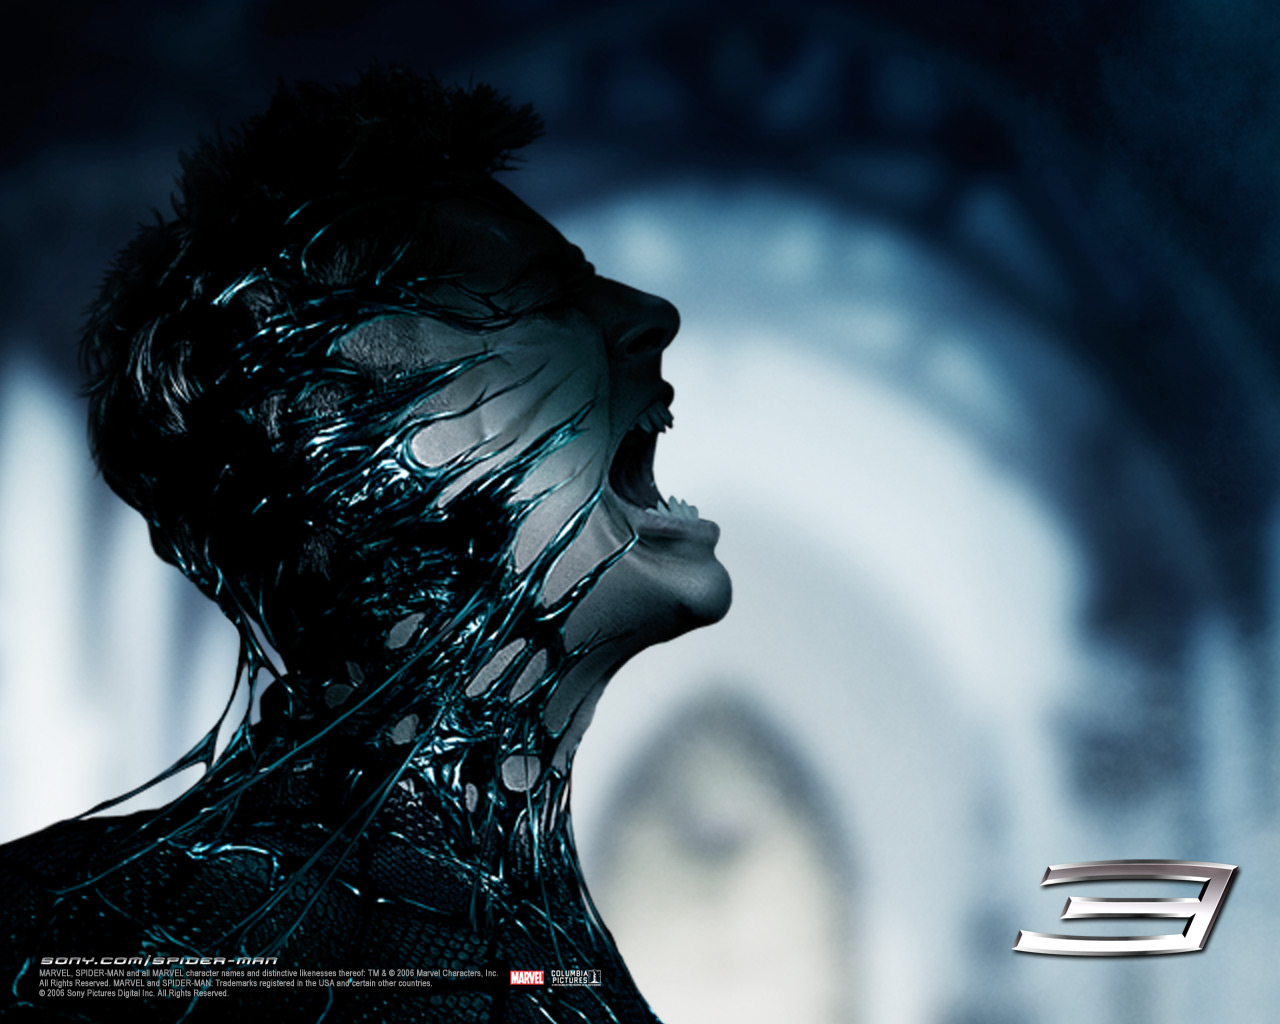 Free Download Black Spiderman 3 Wallpapers Hd 1280x1024